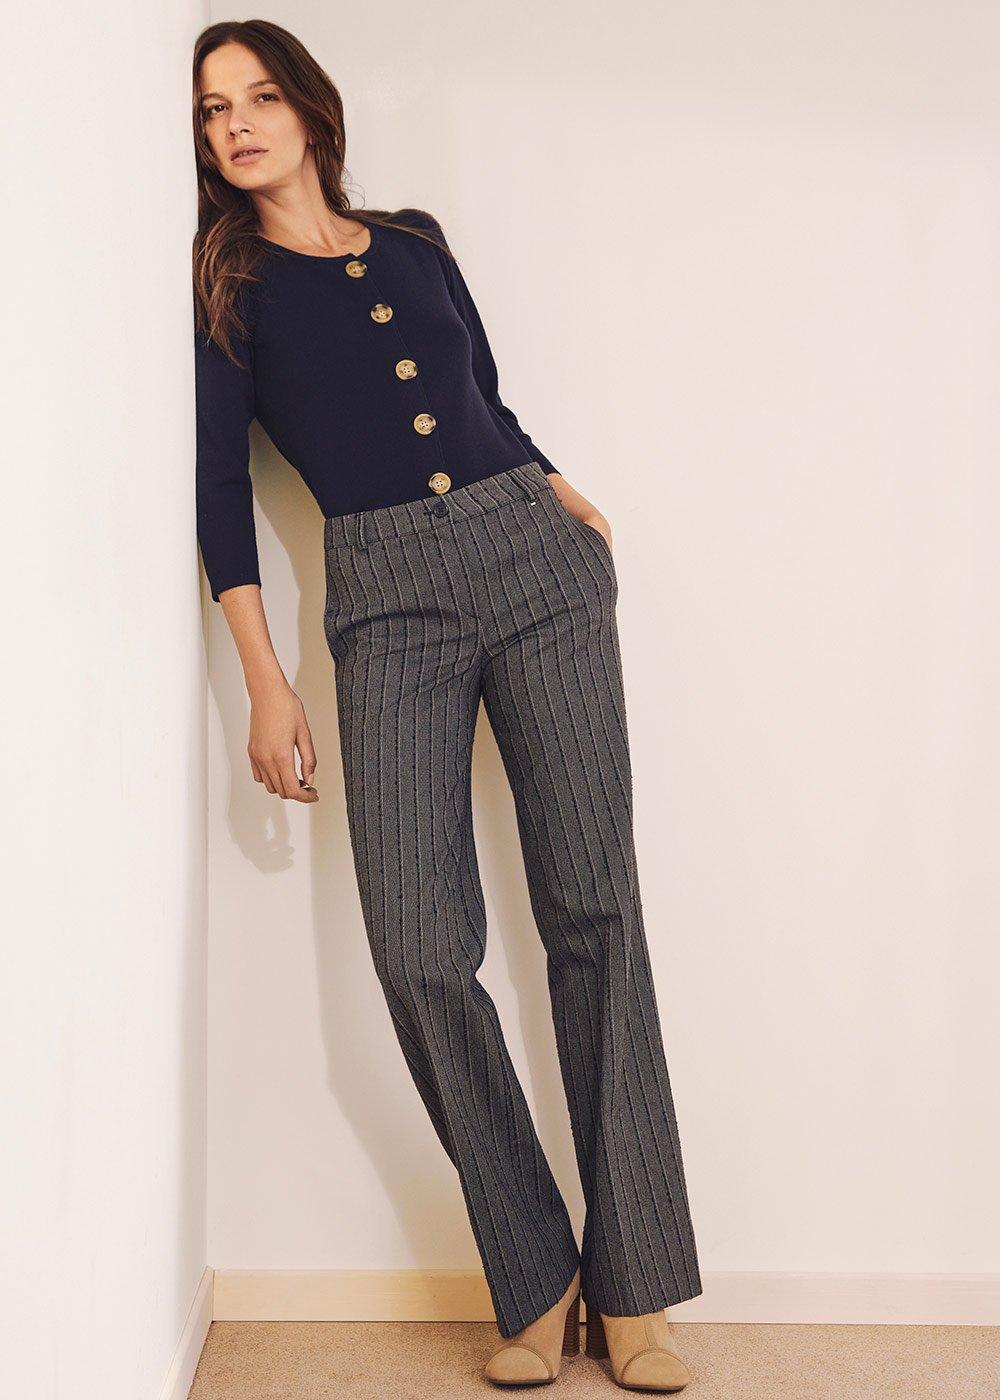 Clair poly-cotton trousers - Blue / Beige Stripes - Woman